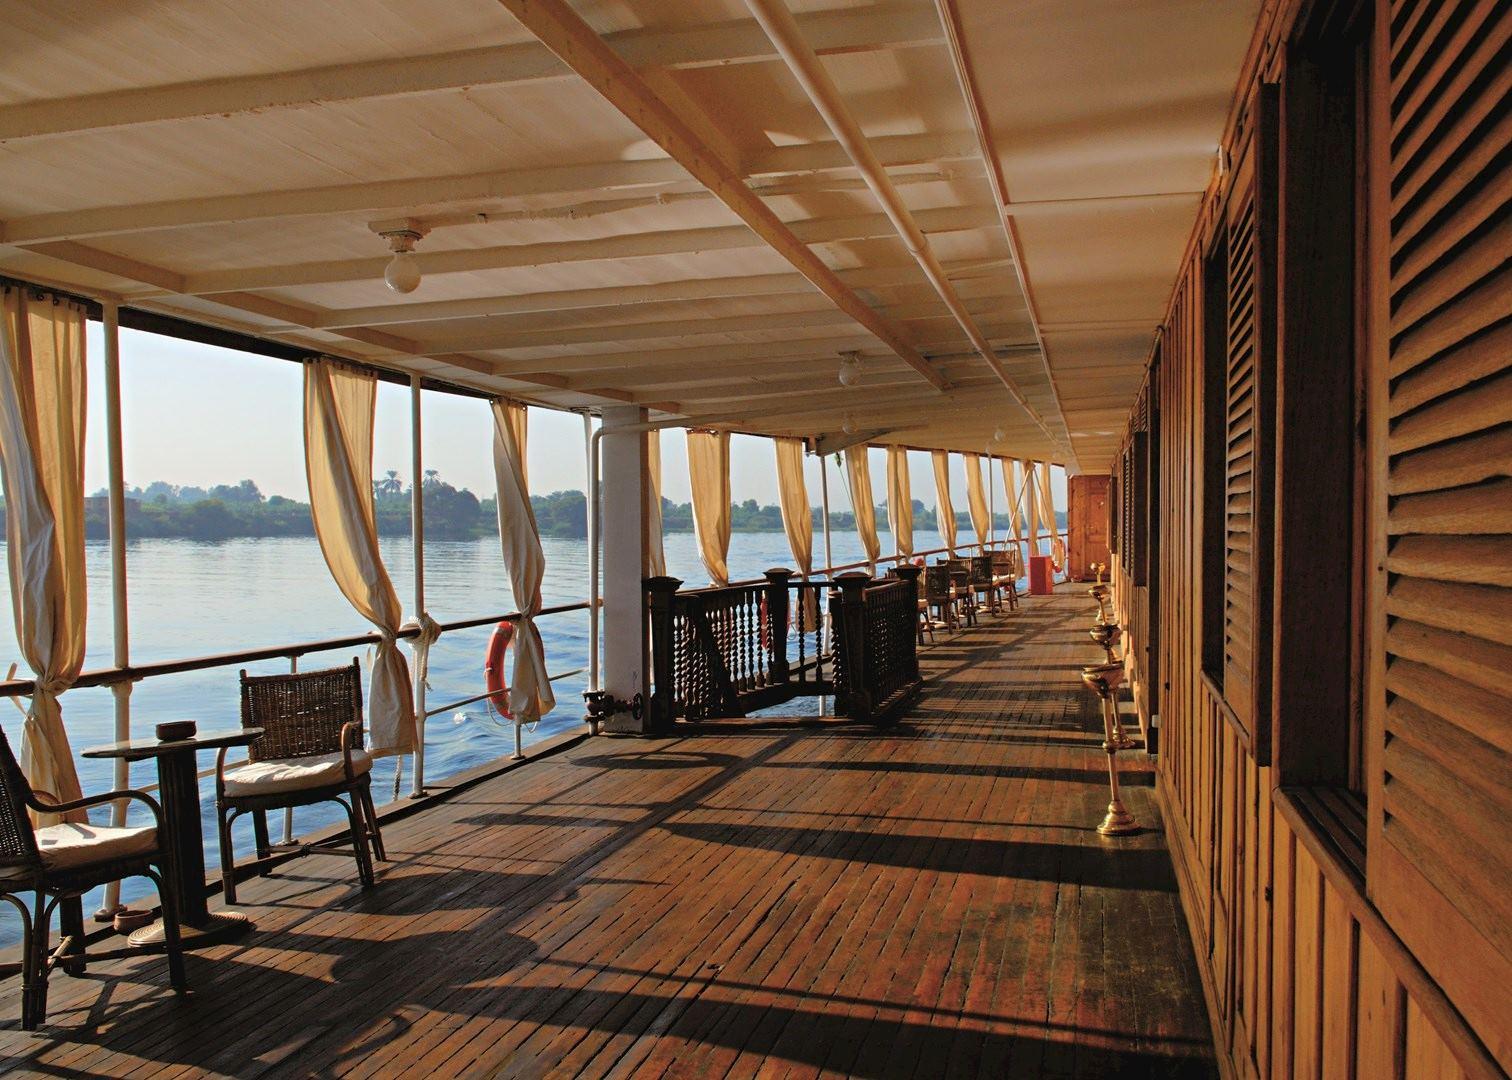 Steam Ship Sudan  Egypt Cruises  Audley Travel